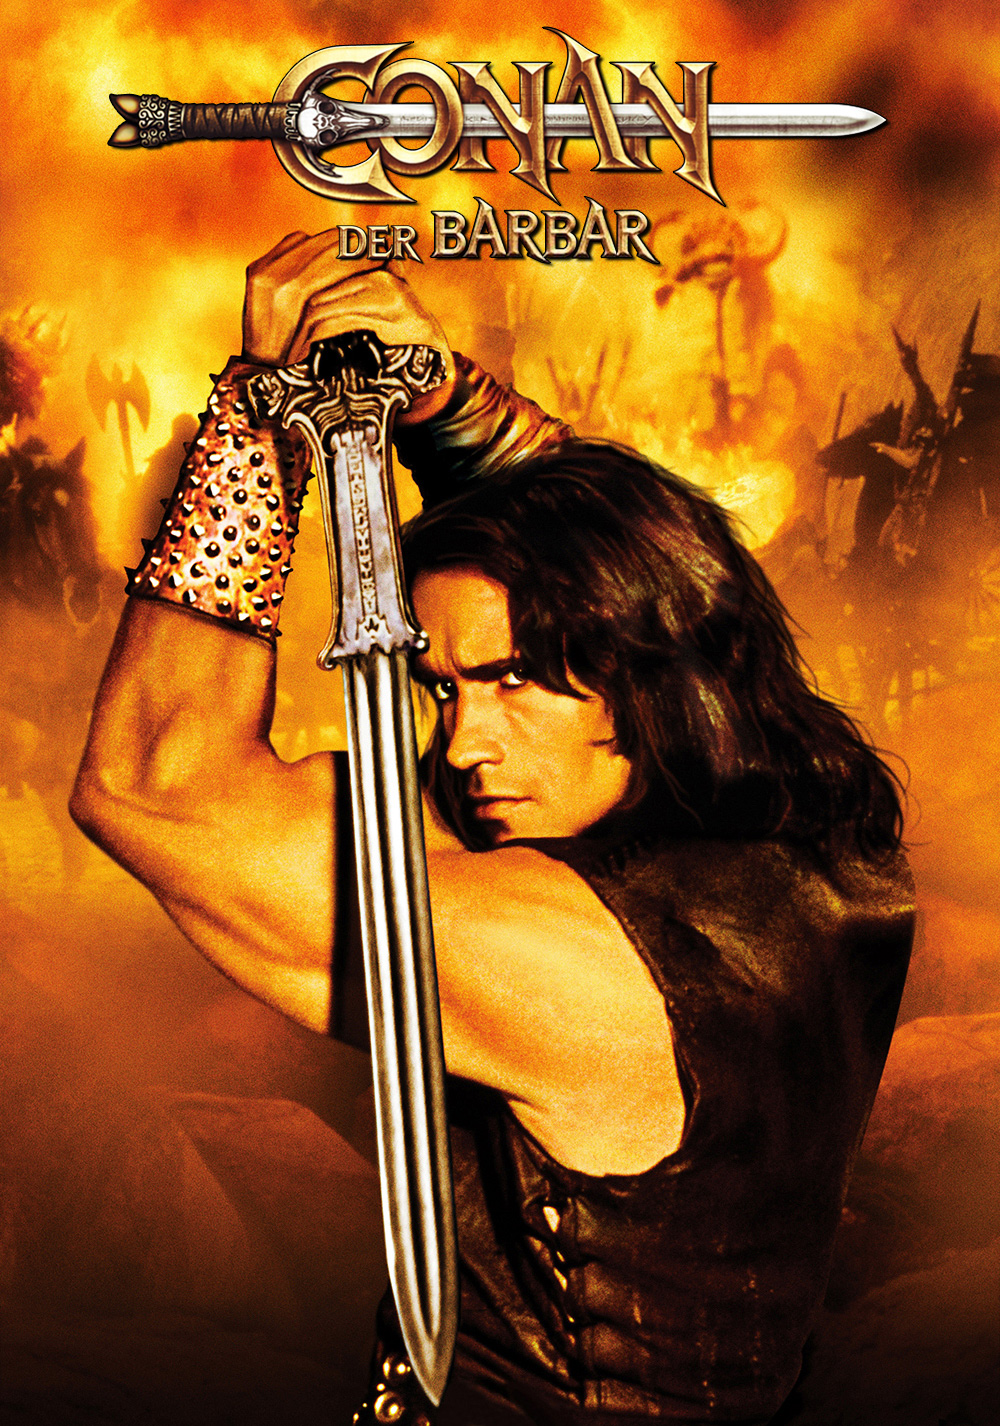 Conan the barbarian stream